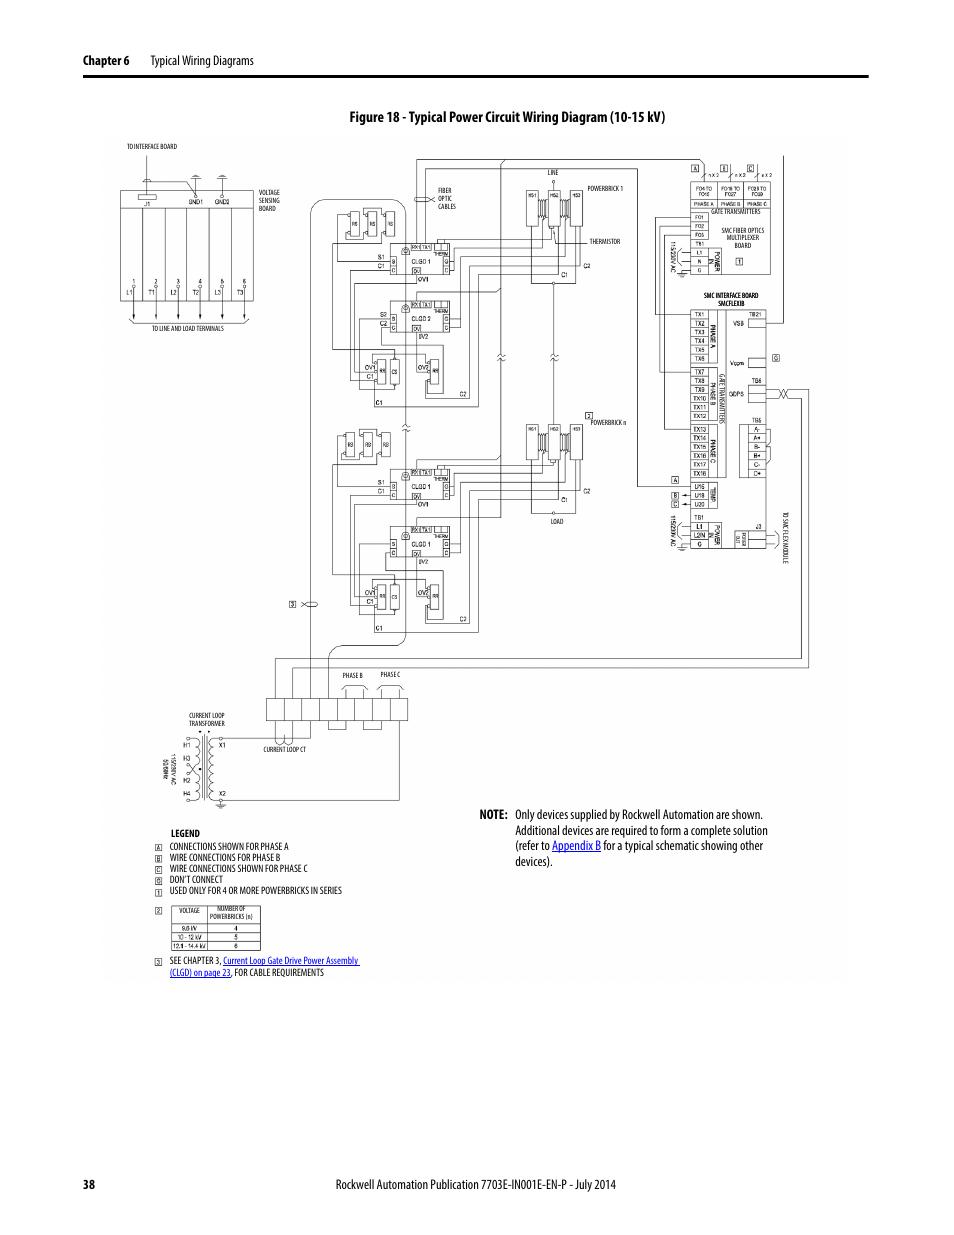 Rockwell Automation 7703e Medium Voltage Smc Oem Components 10 15 Wiring Diagram Kv User Manual